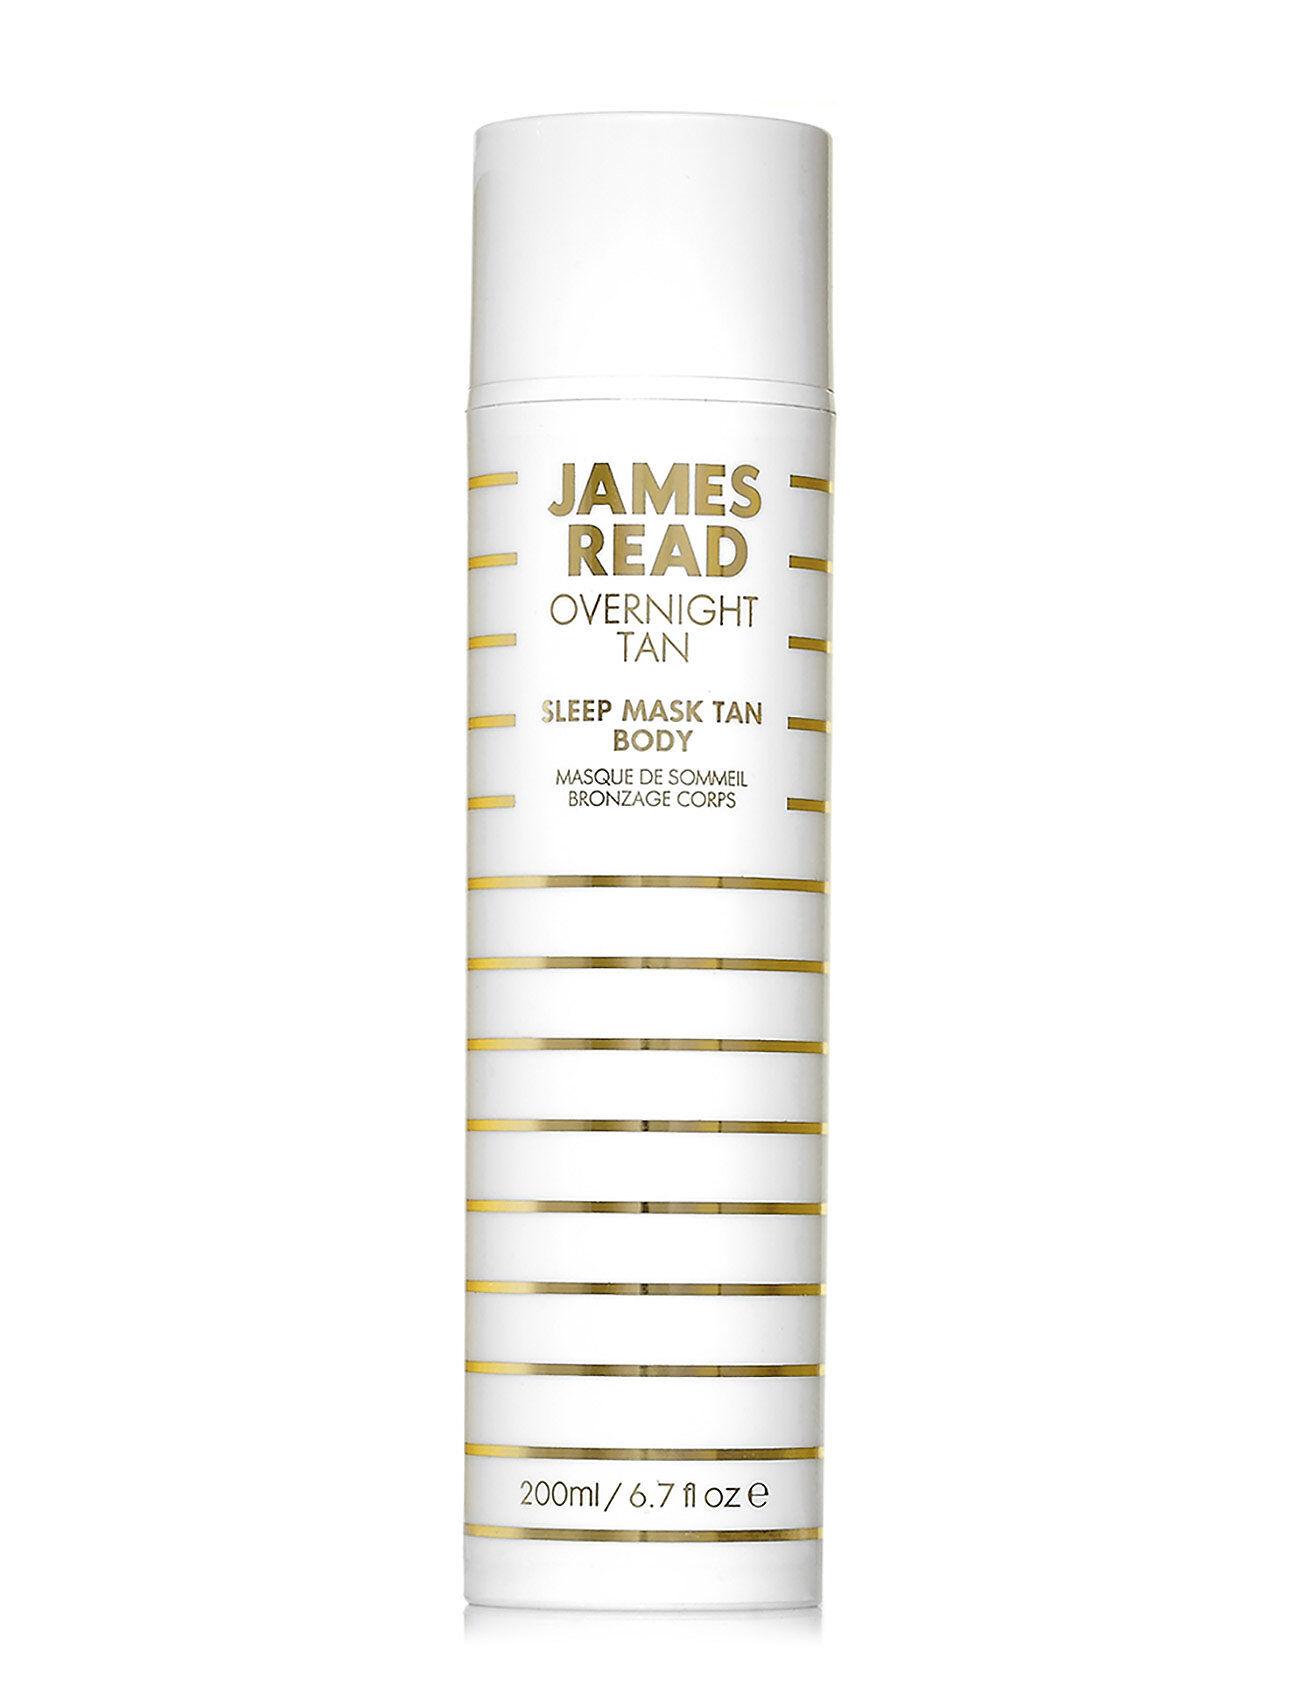 James Read Sleep Mask Tan Body Beauty WOMEN Skin Care Sun Products Self Tanners Nude James Read